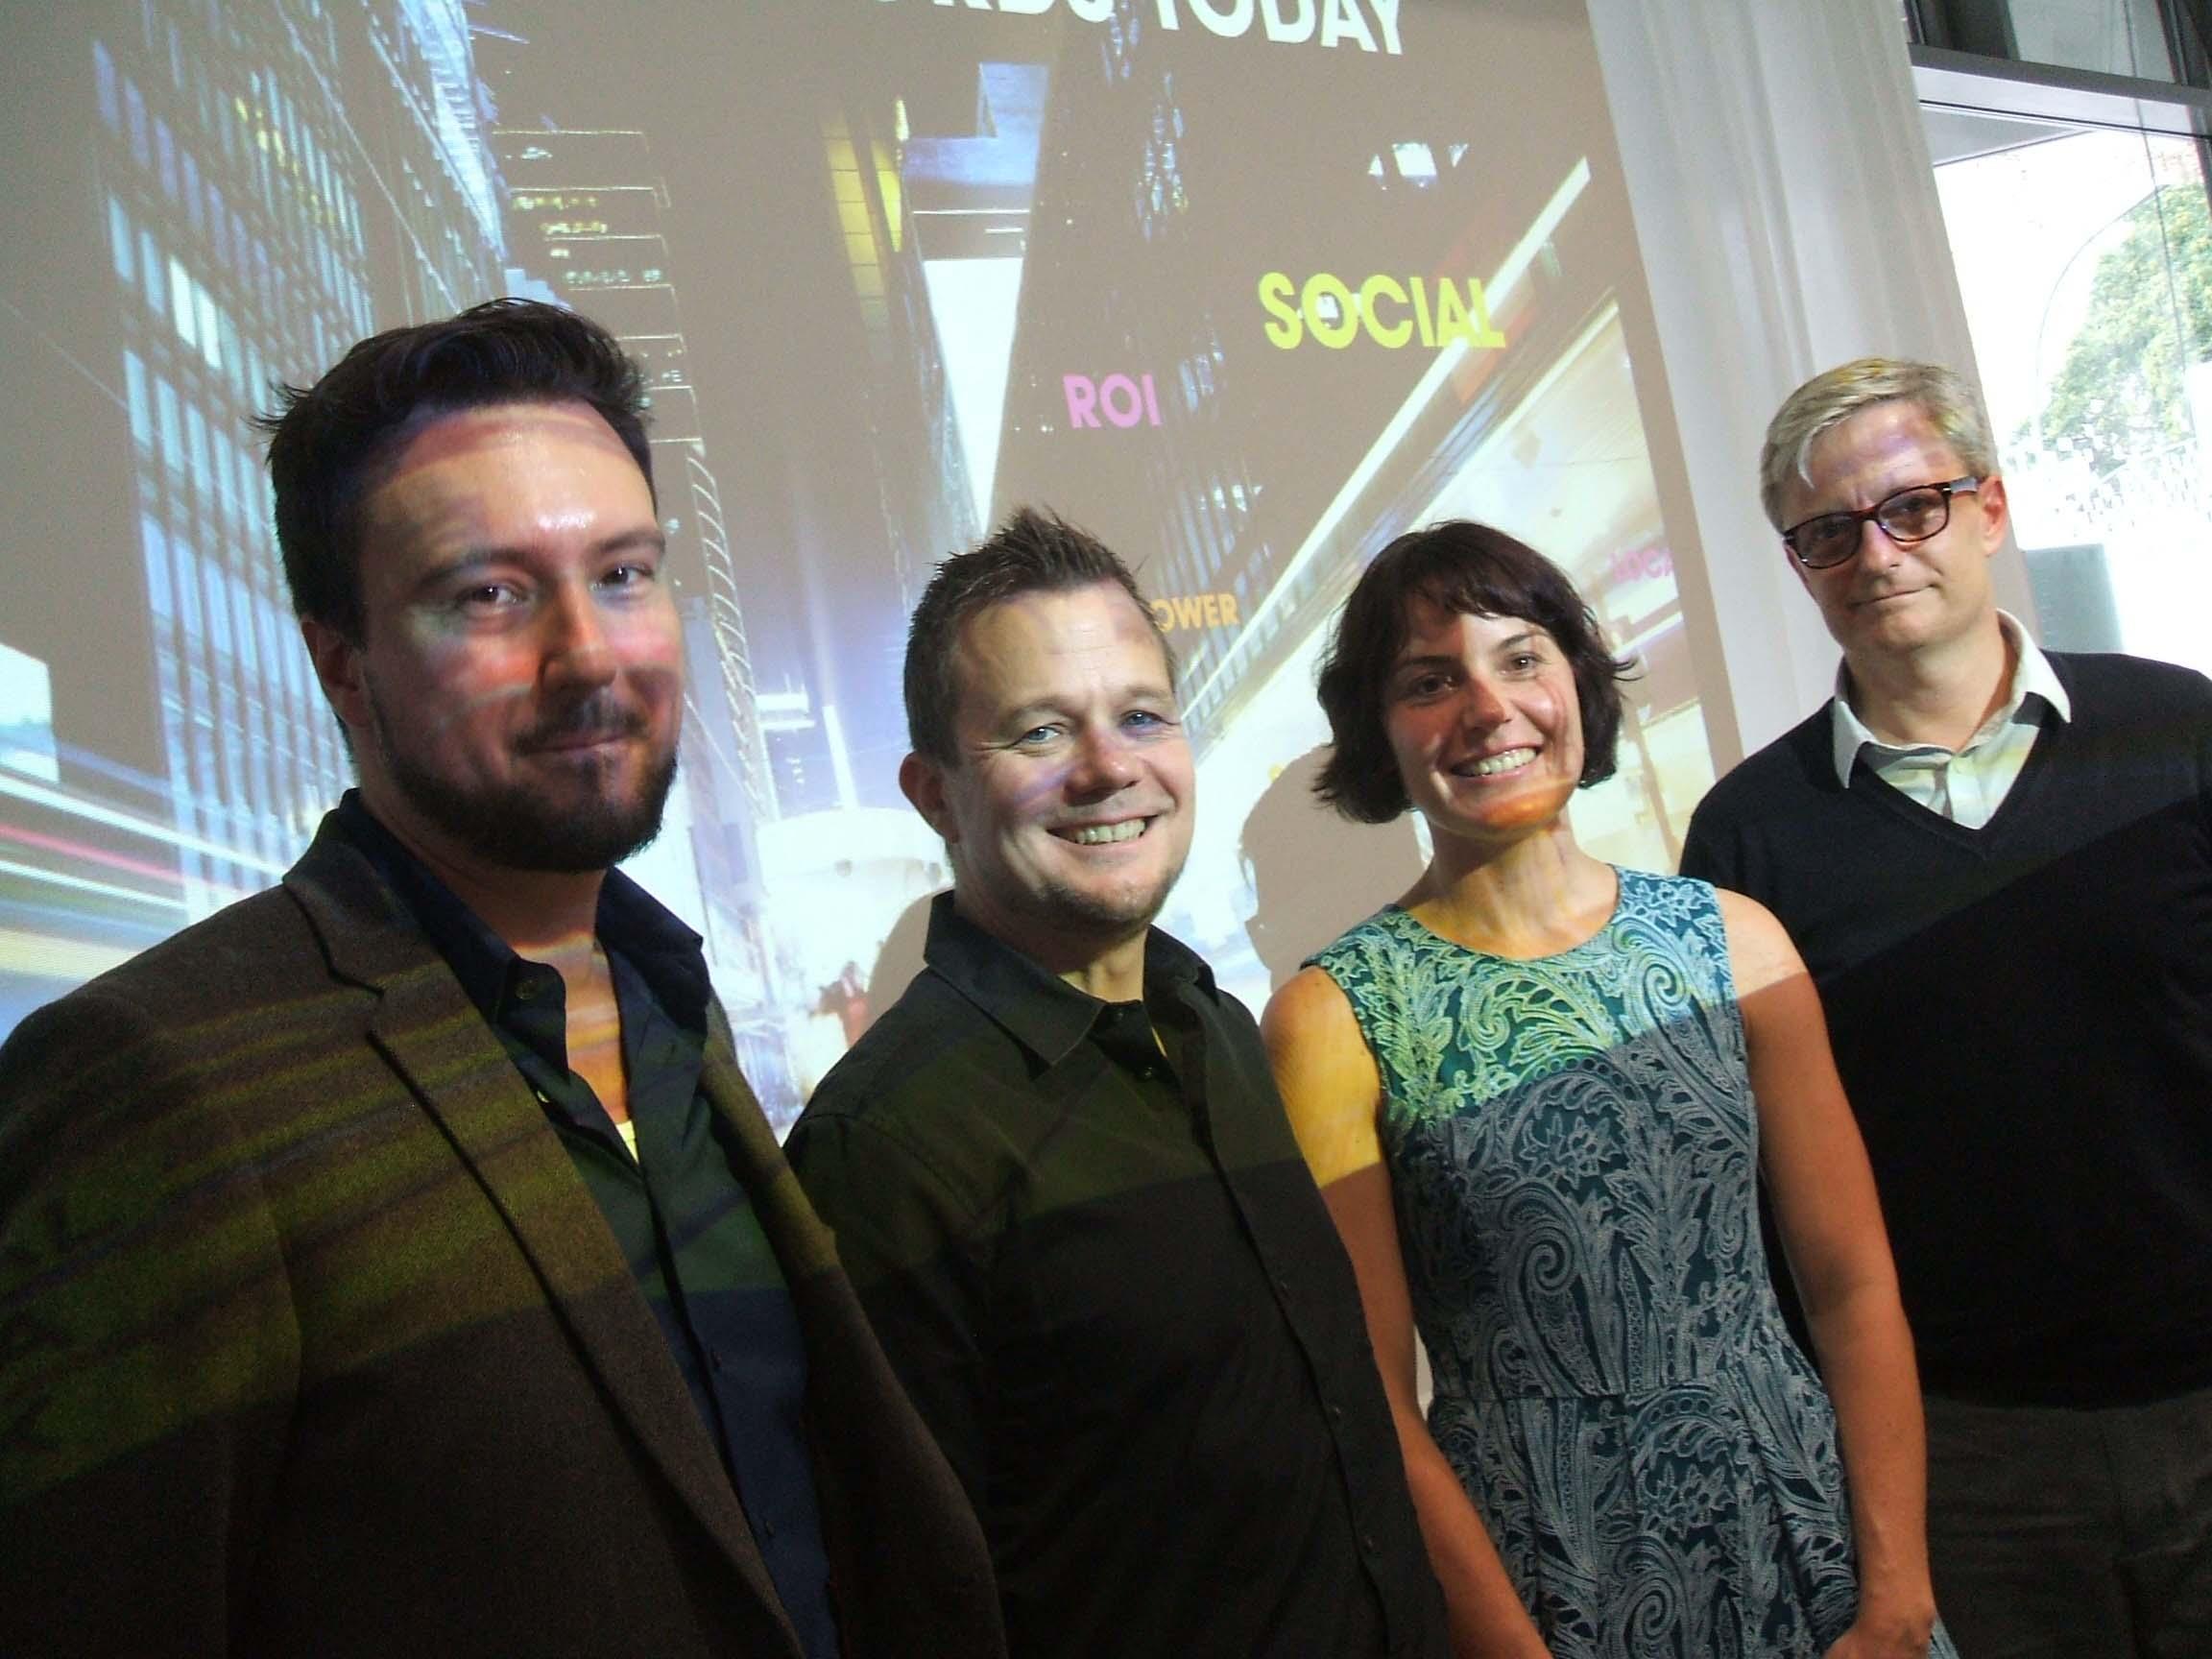 Ulrik Bo Larsen | Falcon Social, Roland Fiege | Mediabrands Audience Platform, Armgard Eichhoff | Bazaarvoice, Thane Ryland | Nokia